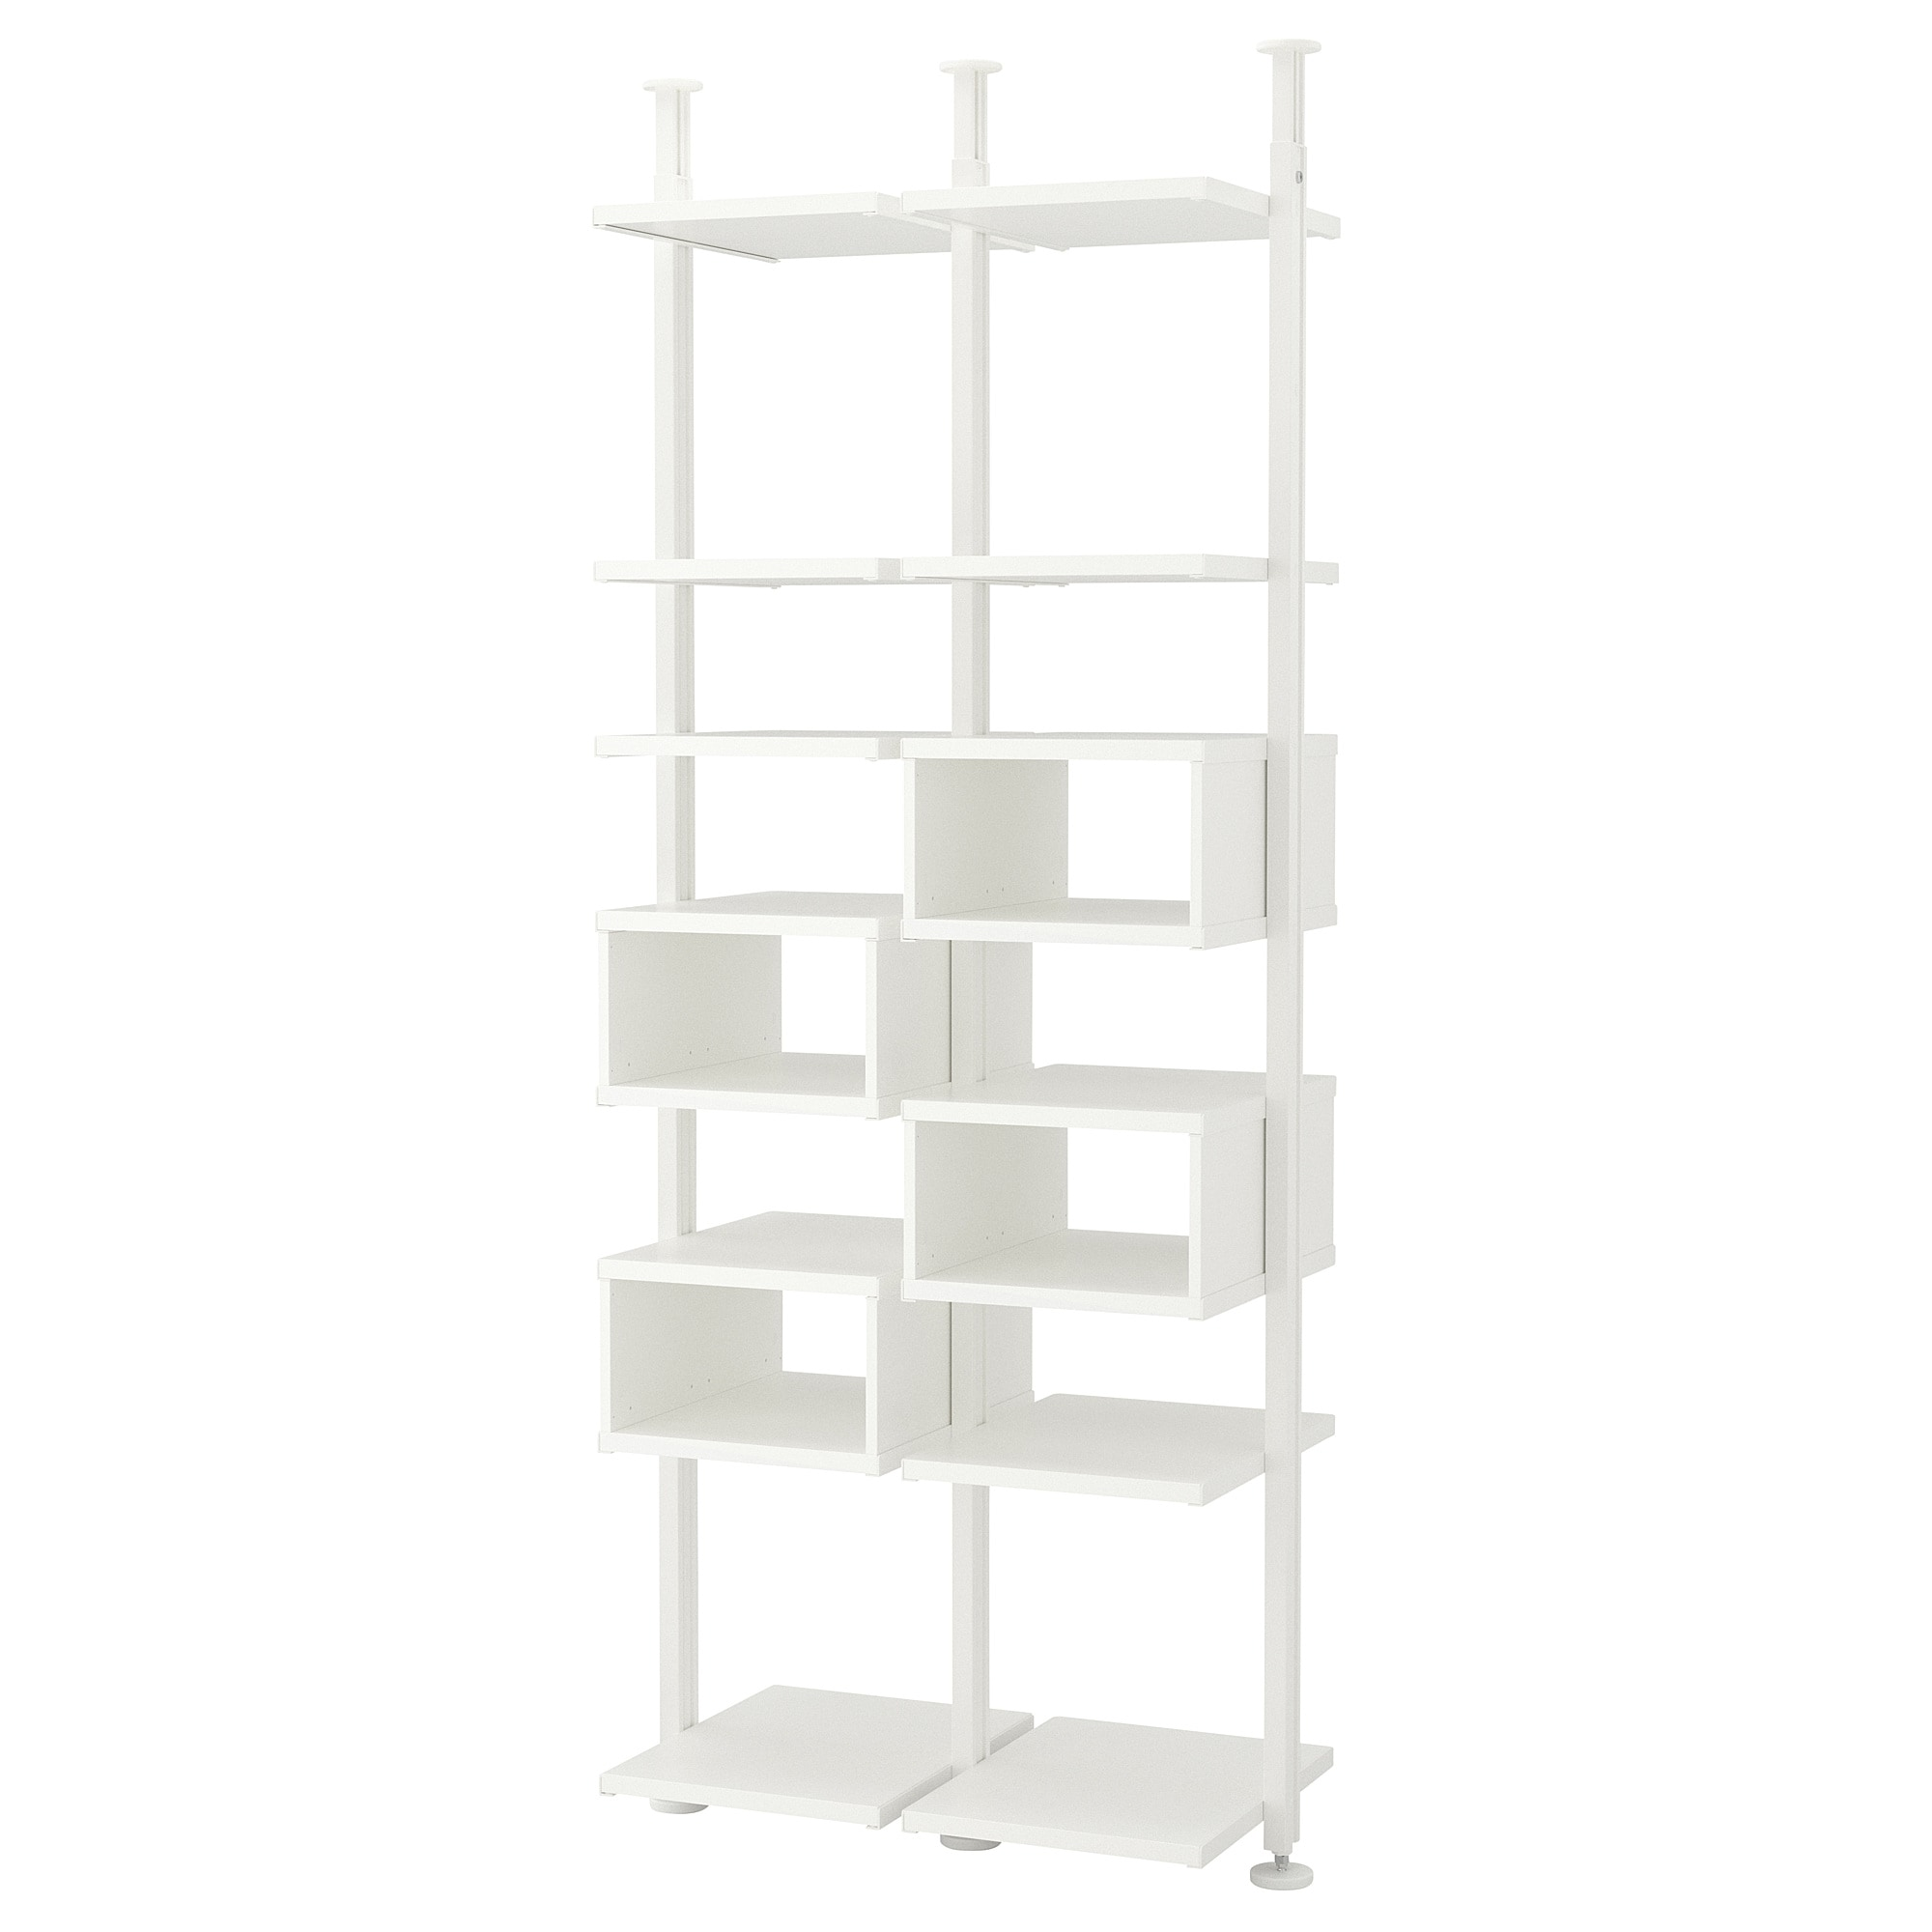 2 секции ЭЛВАРЛИ белый артикуль № 292.517.76 в наличии. Онлайн сайт IKEA Беларусь. Недорогая доставка и монтаж.